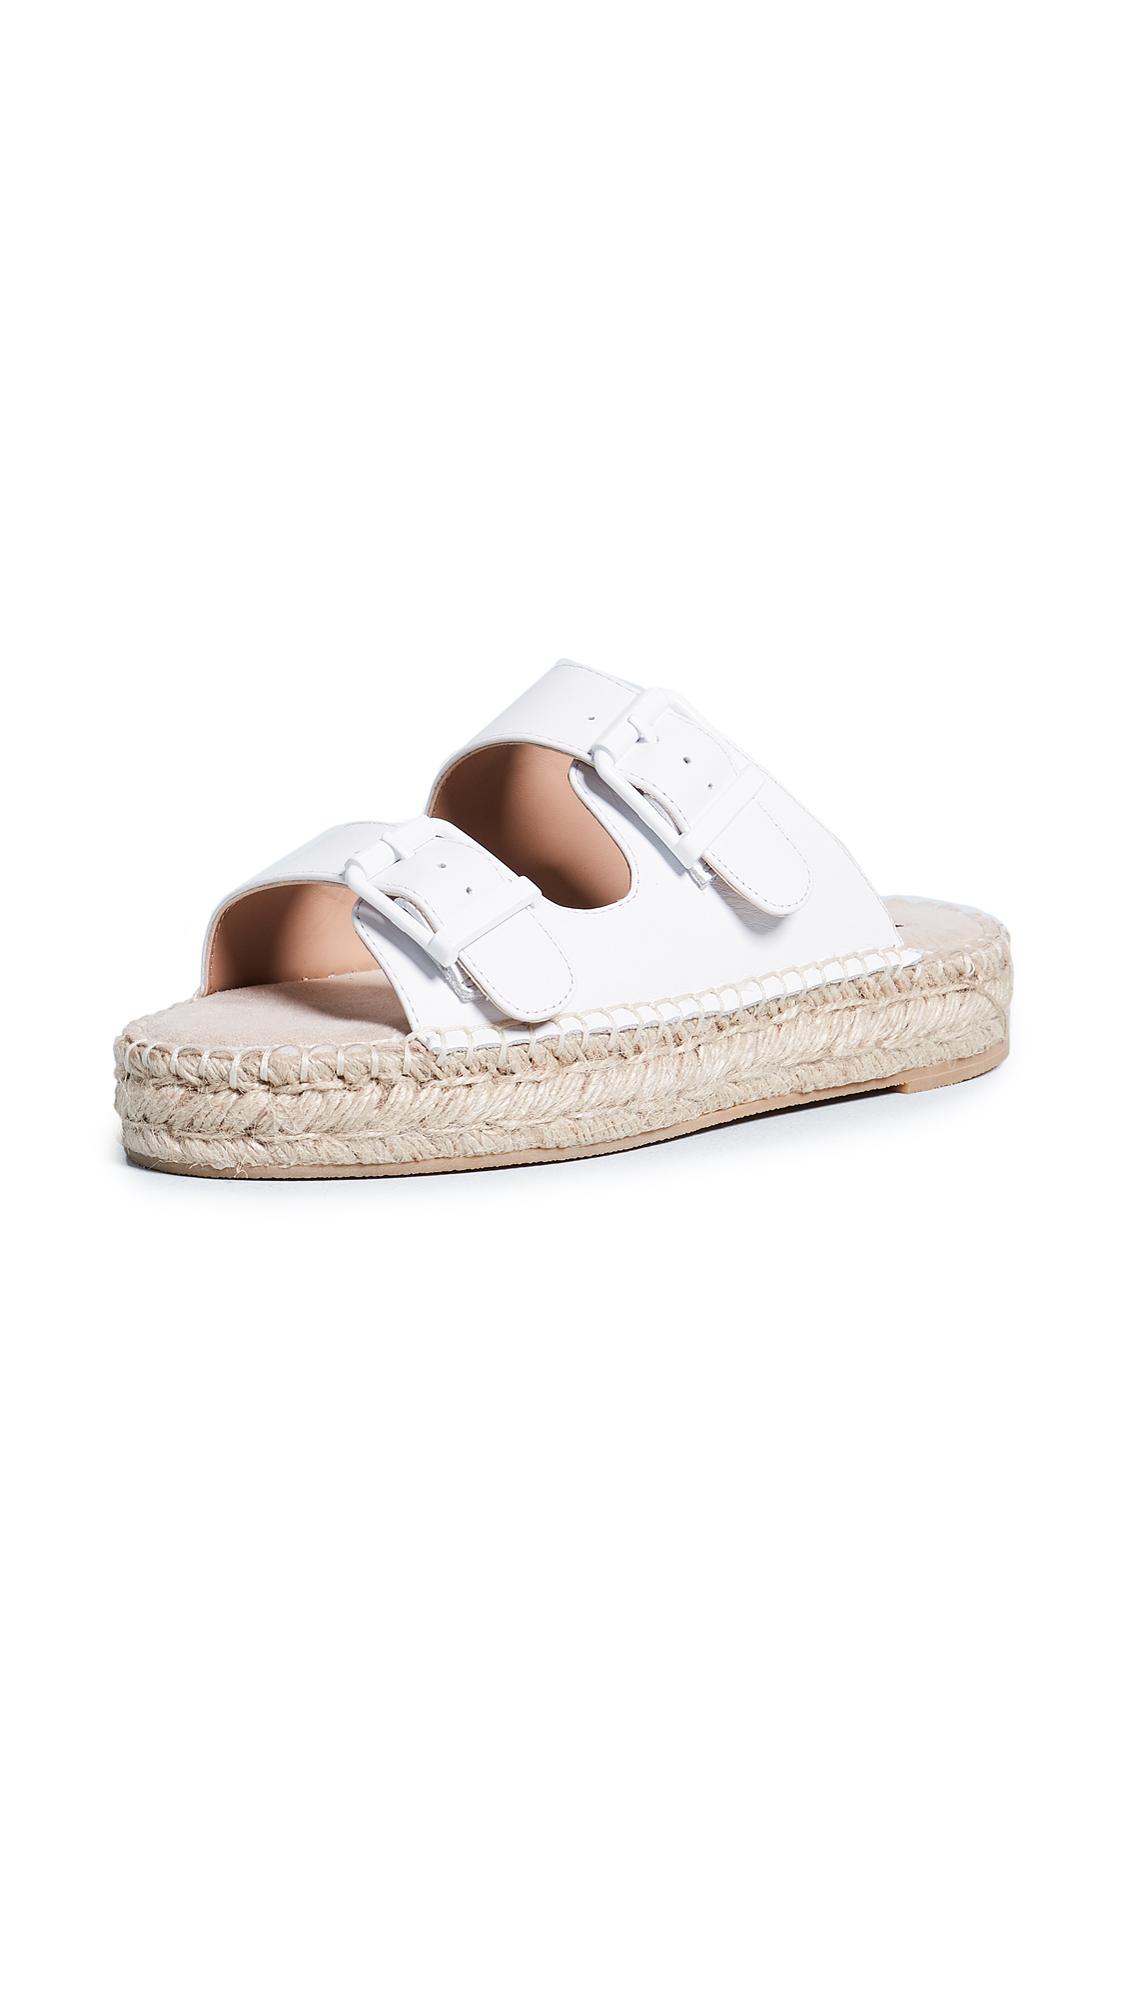 Steven Lapis Espadrille Sandals - White